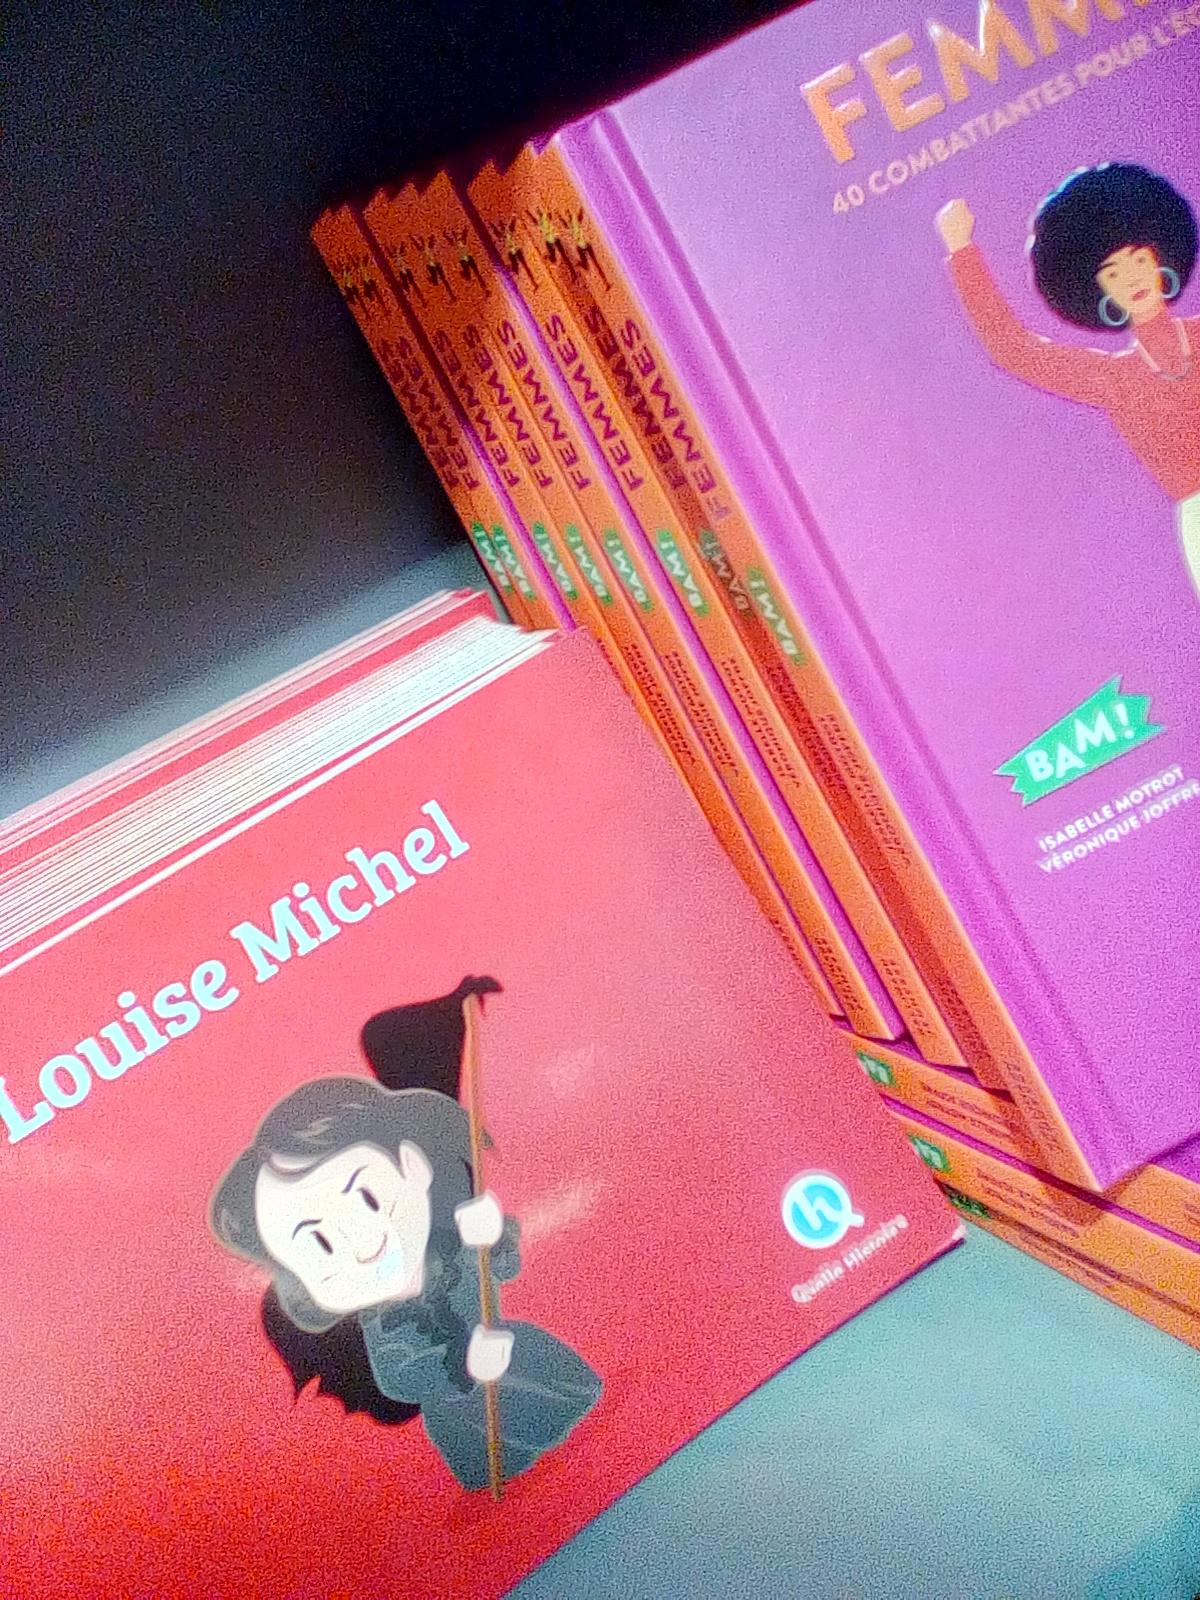 H αγαπημένη μου Λουίζ Μισέλ έγινε κόμικς,καρτούν,φιλμ χαρακτηρων,θέατρο κ.α